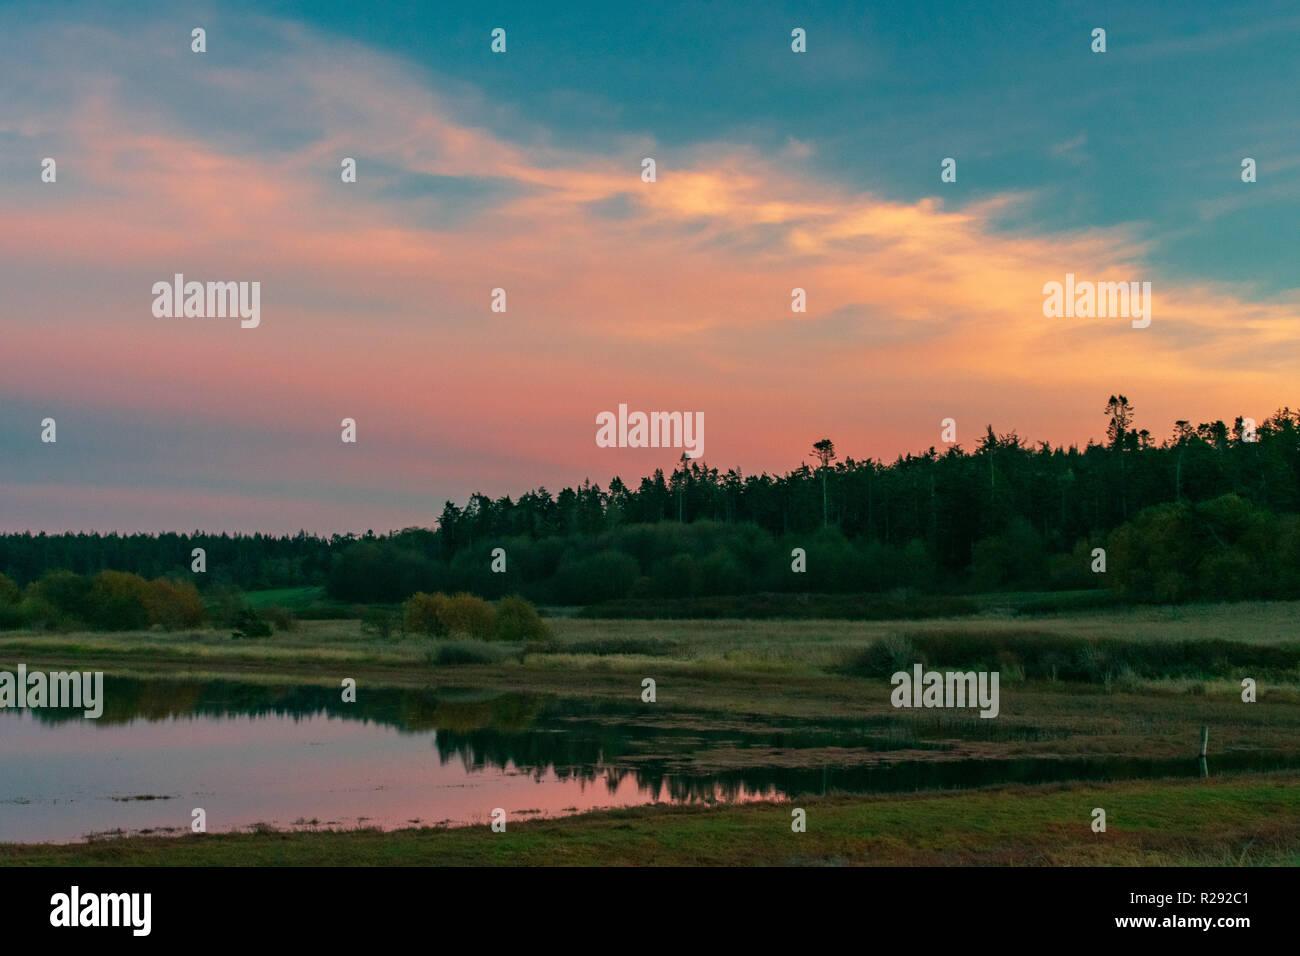 Sunset Reflecting In A Lake On Whidbey Island, Washington Stock Photo